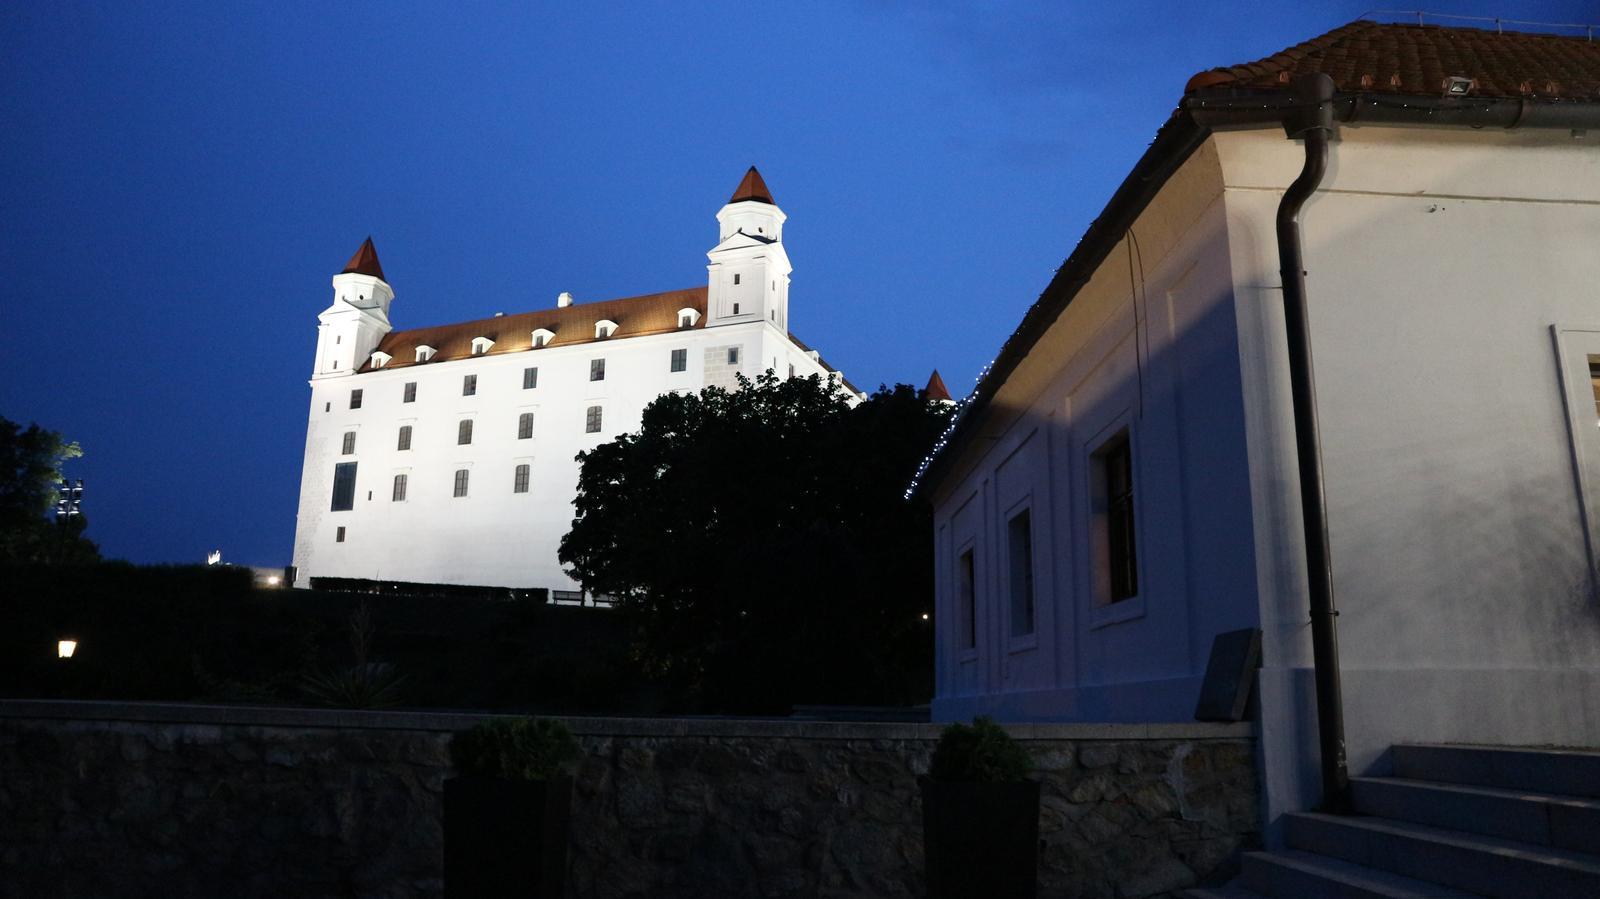 Svadba - Reštaurácia Hrad Bratislava - dj eLLy d - Svadba - Reštaurácia Hrad Bratislava - dj eLLy d